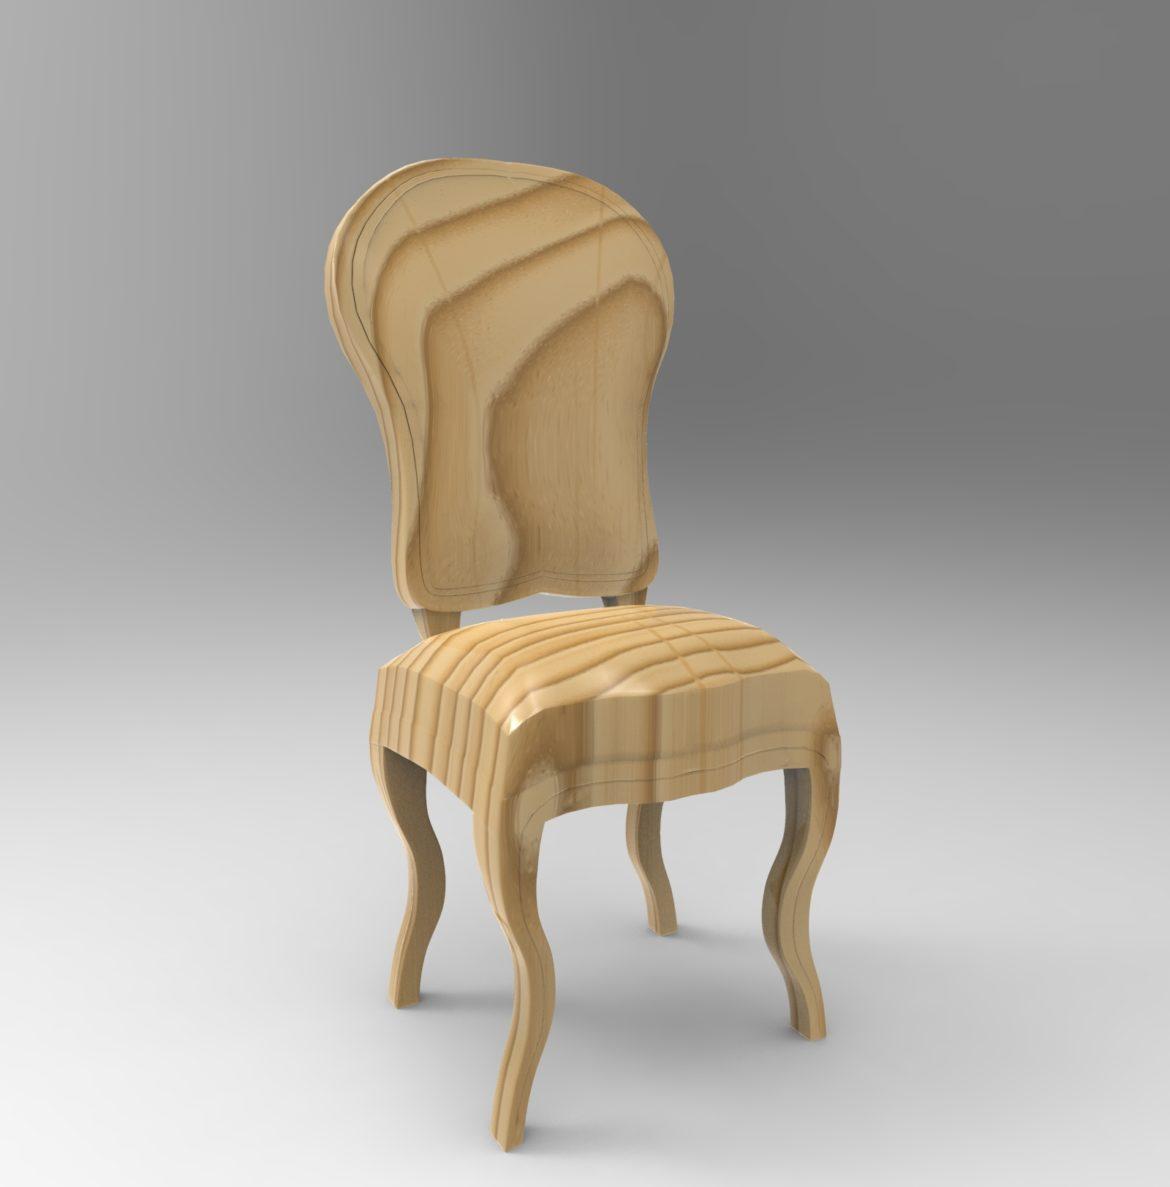 chair chapender-7 3d model max obj 295874